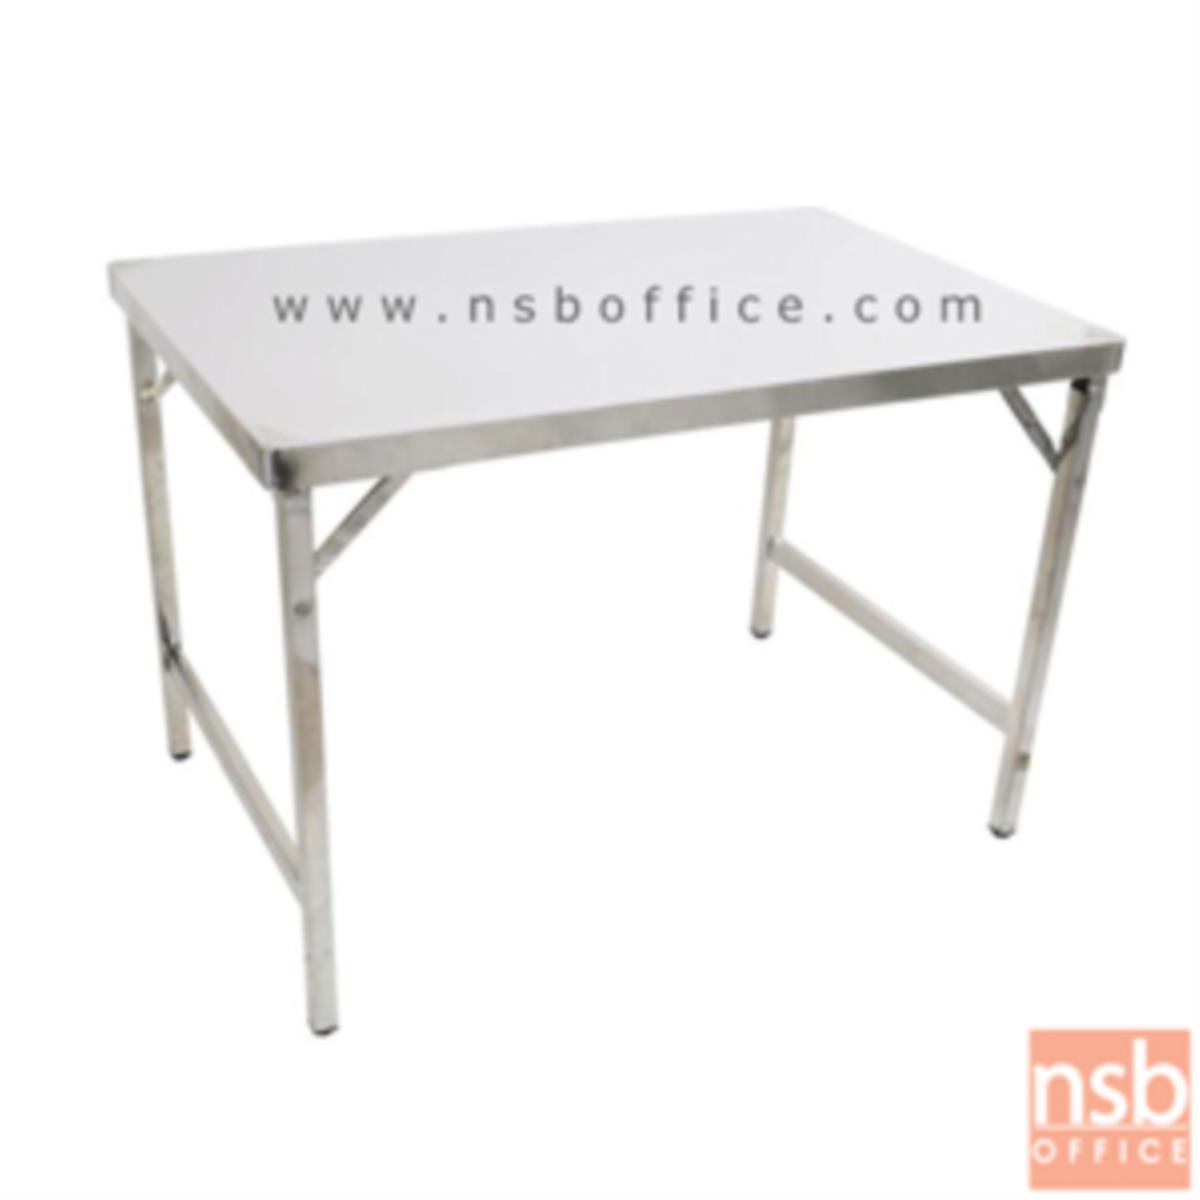 G12A104:โต๊ะหน้าสเตนเลส รุ่น Jezebel (เจซเบล) ขนาด 110W cm.  ขาปรับระดับได้